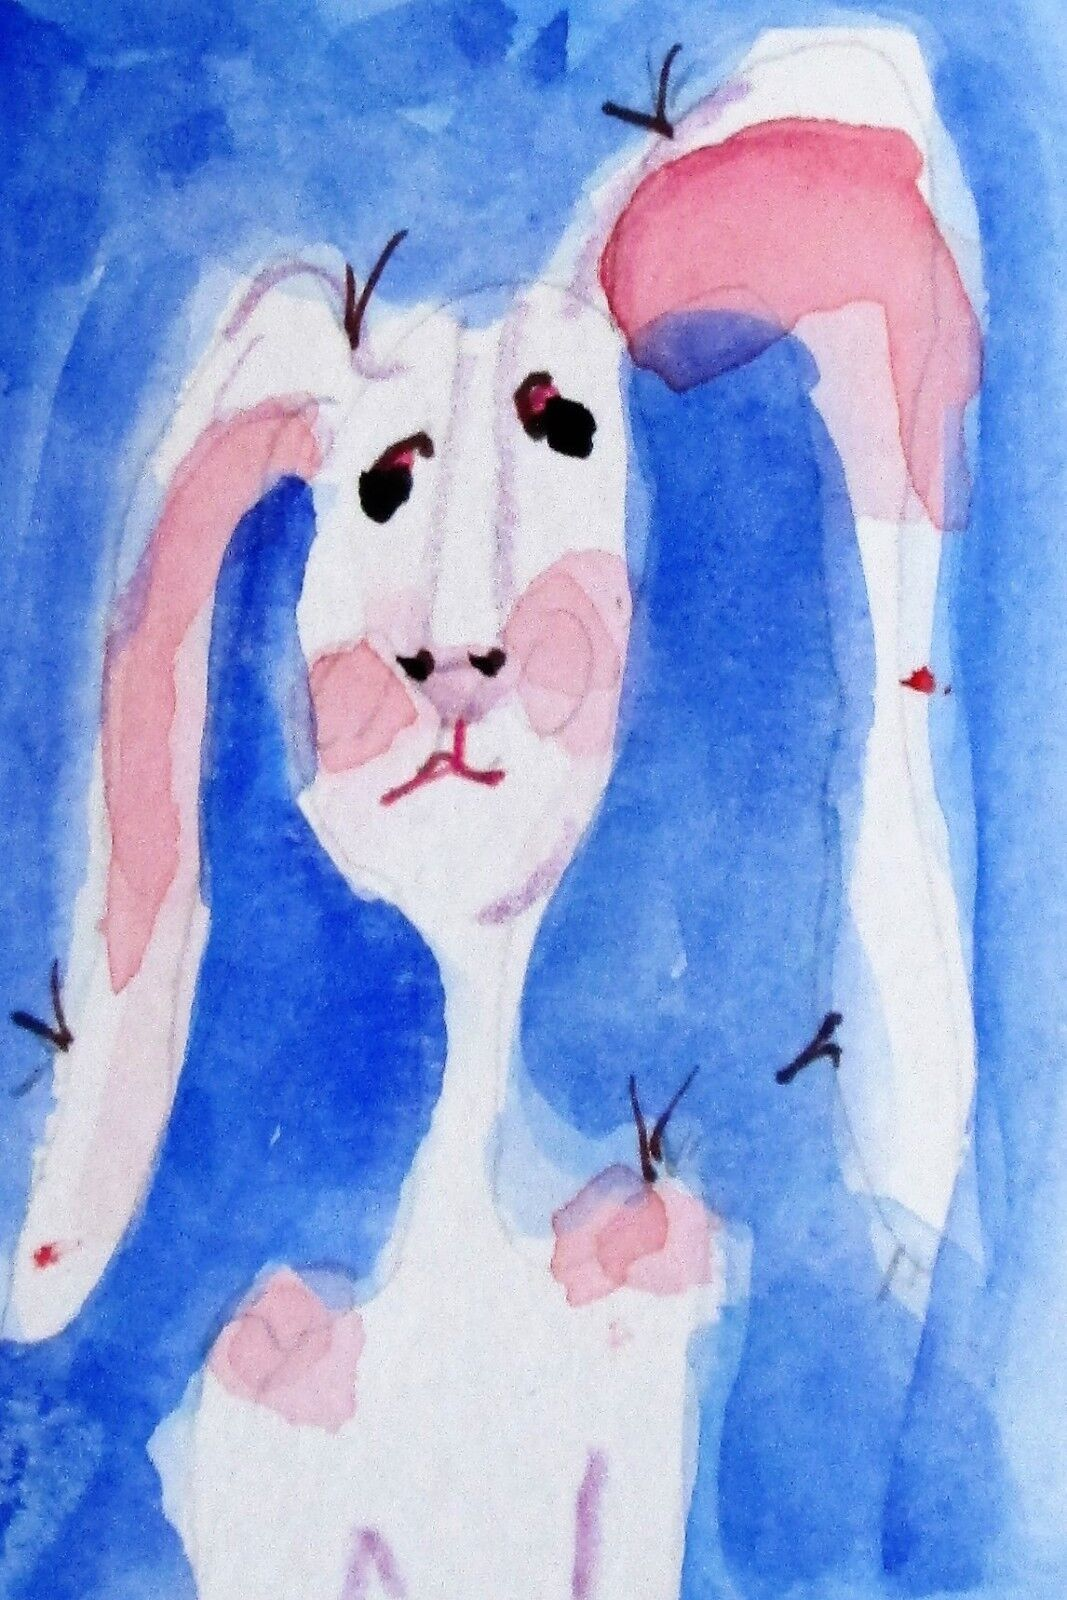 Aceo Long Eared Bunny Rabbit Watercolor Miniature Delilah Art - $7.50